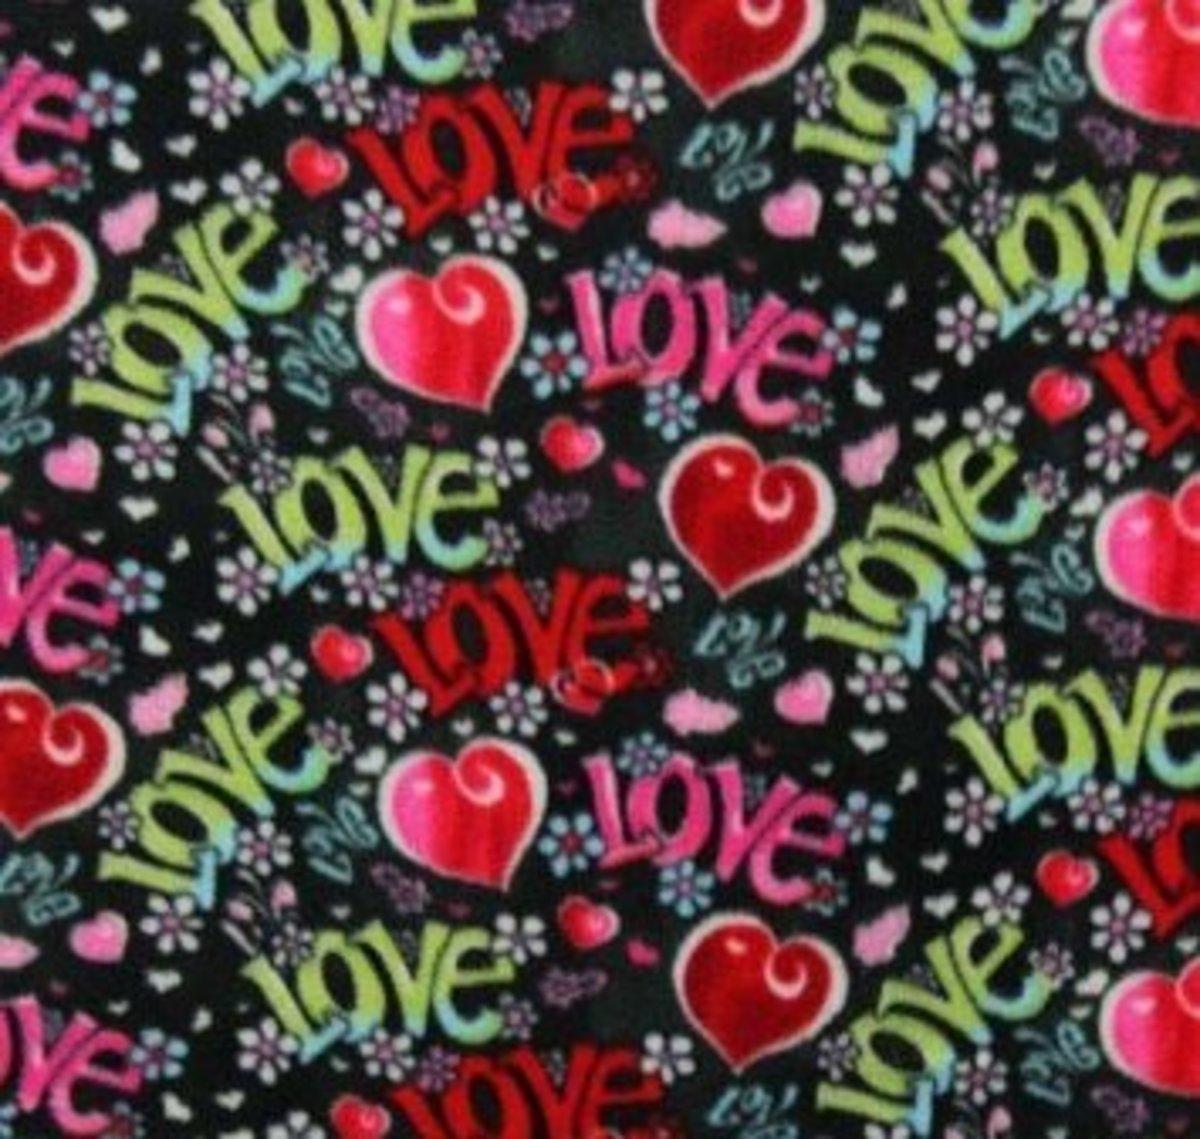 Love Hearts Fabric Photo